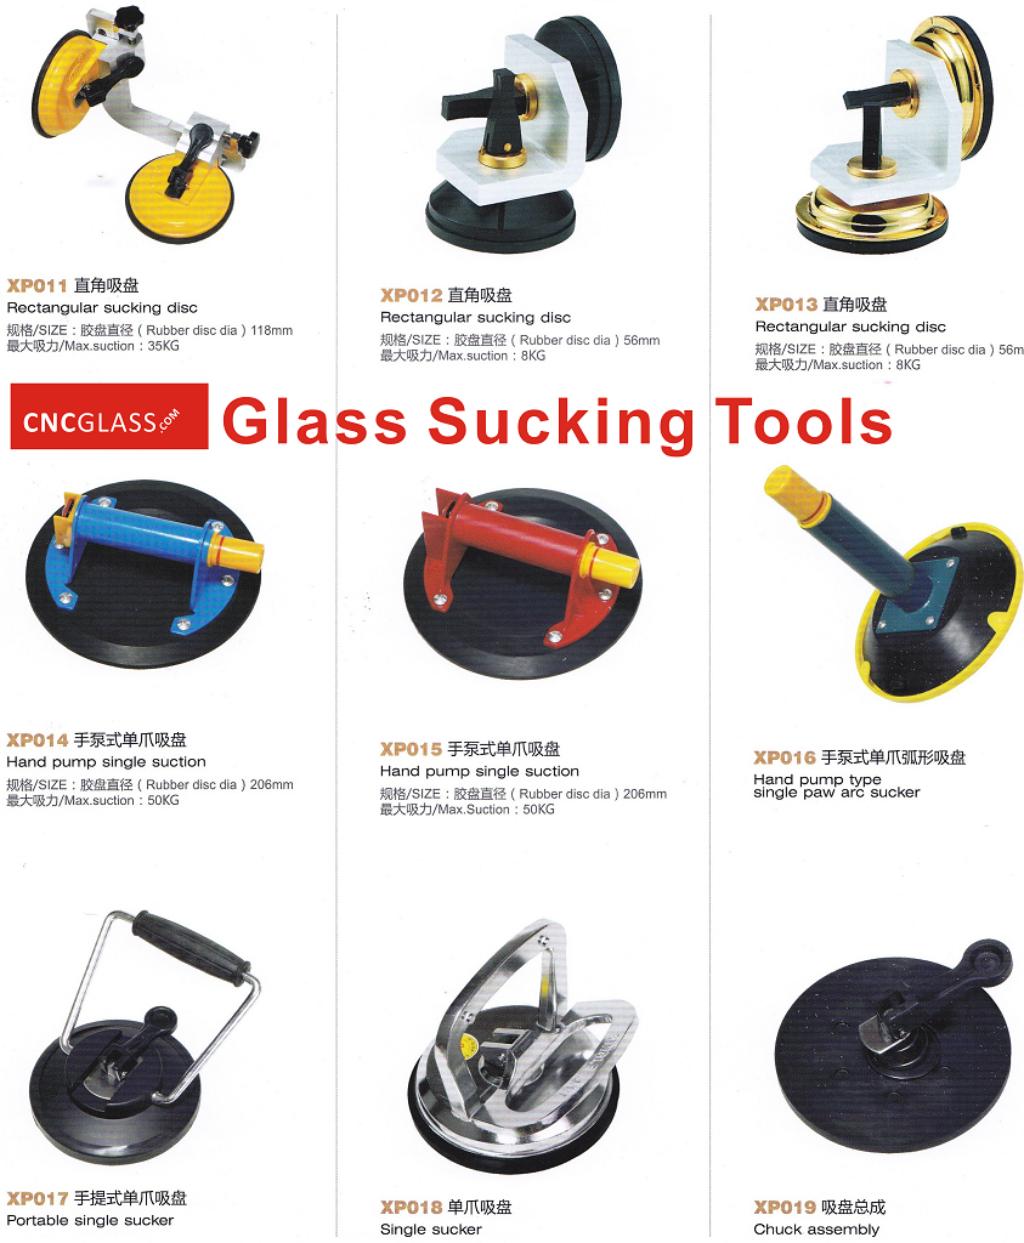 Glass Sucking Tools2